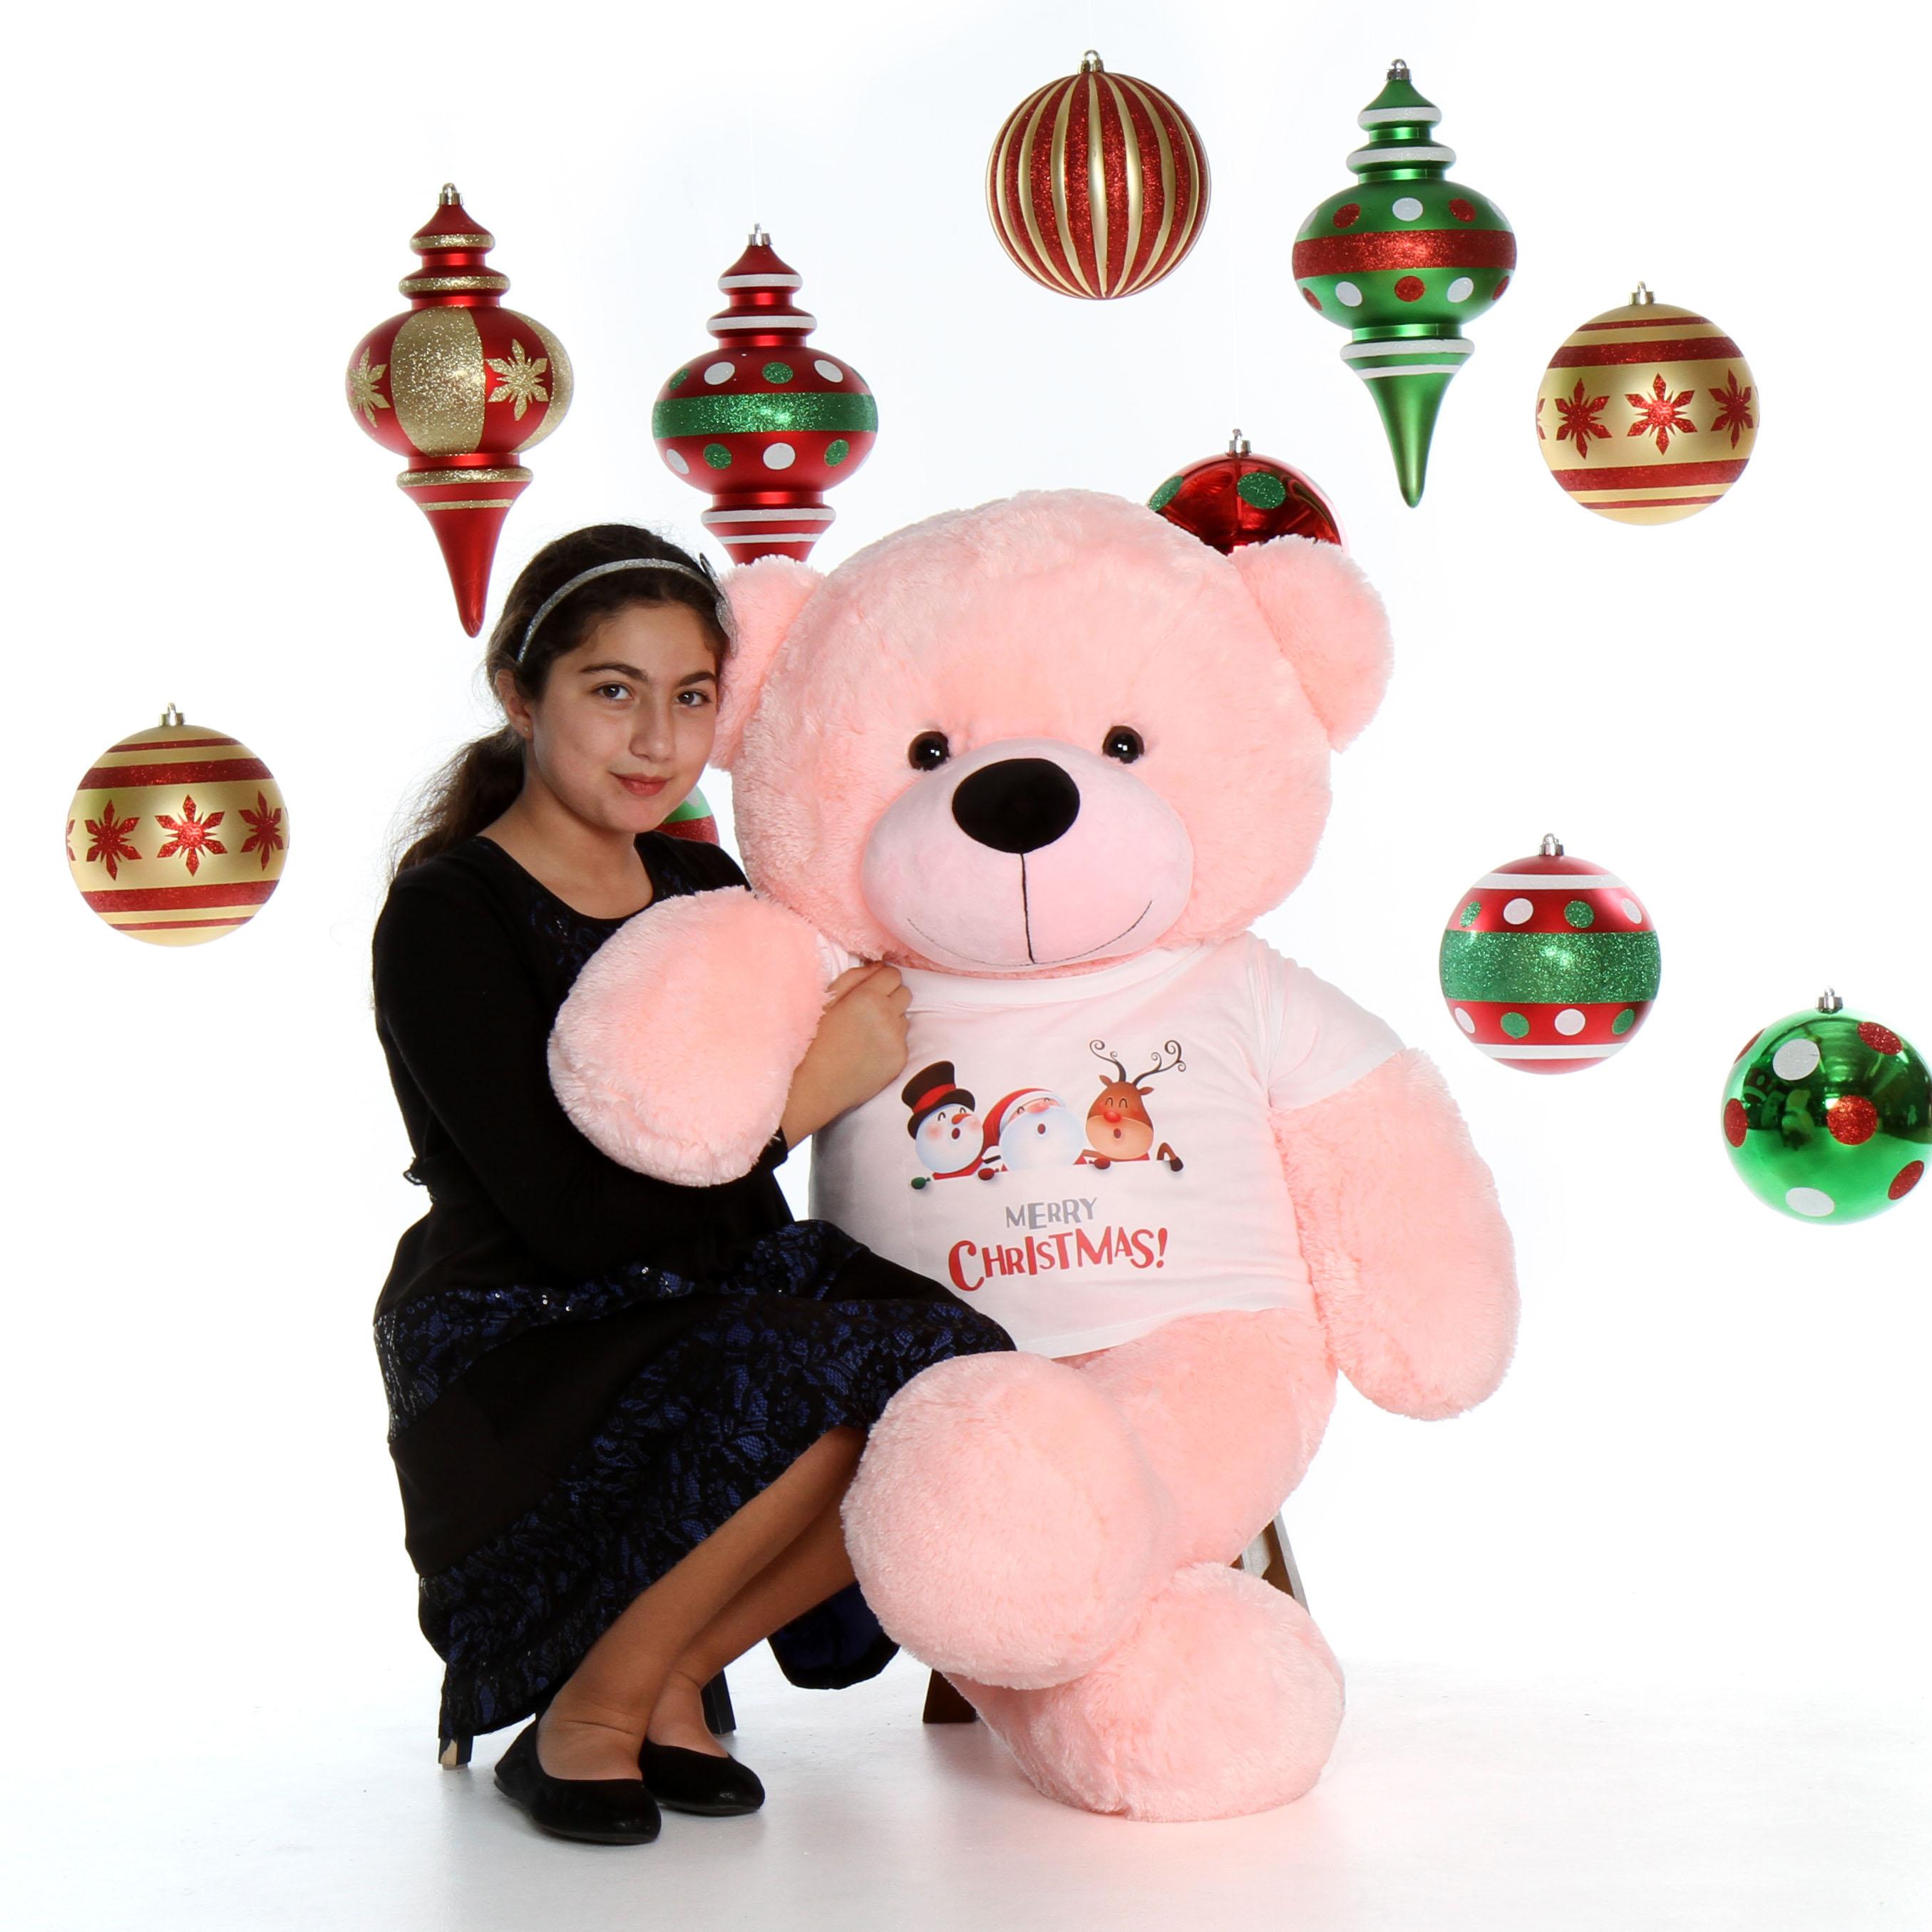 4ft-lady-cuddles-rose-pink-merry-christmas-teddy-bear.jpg